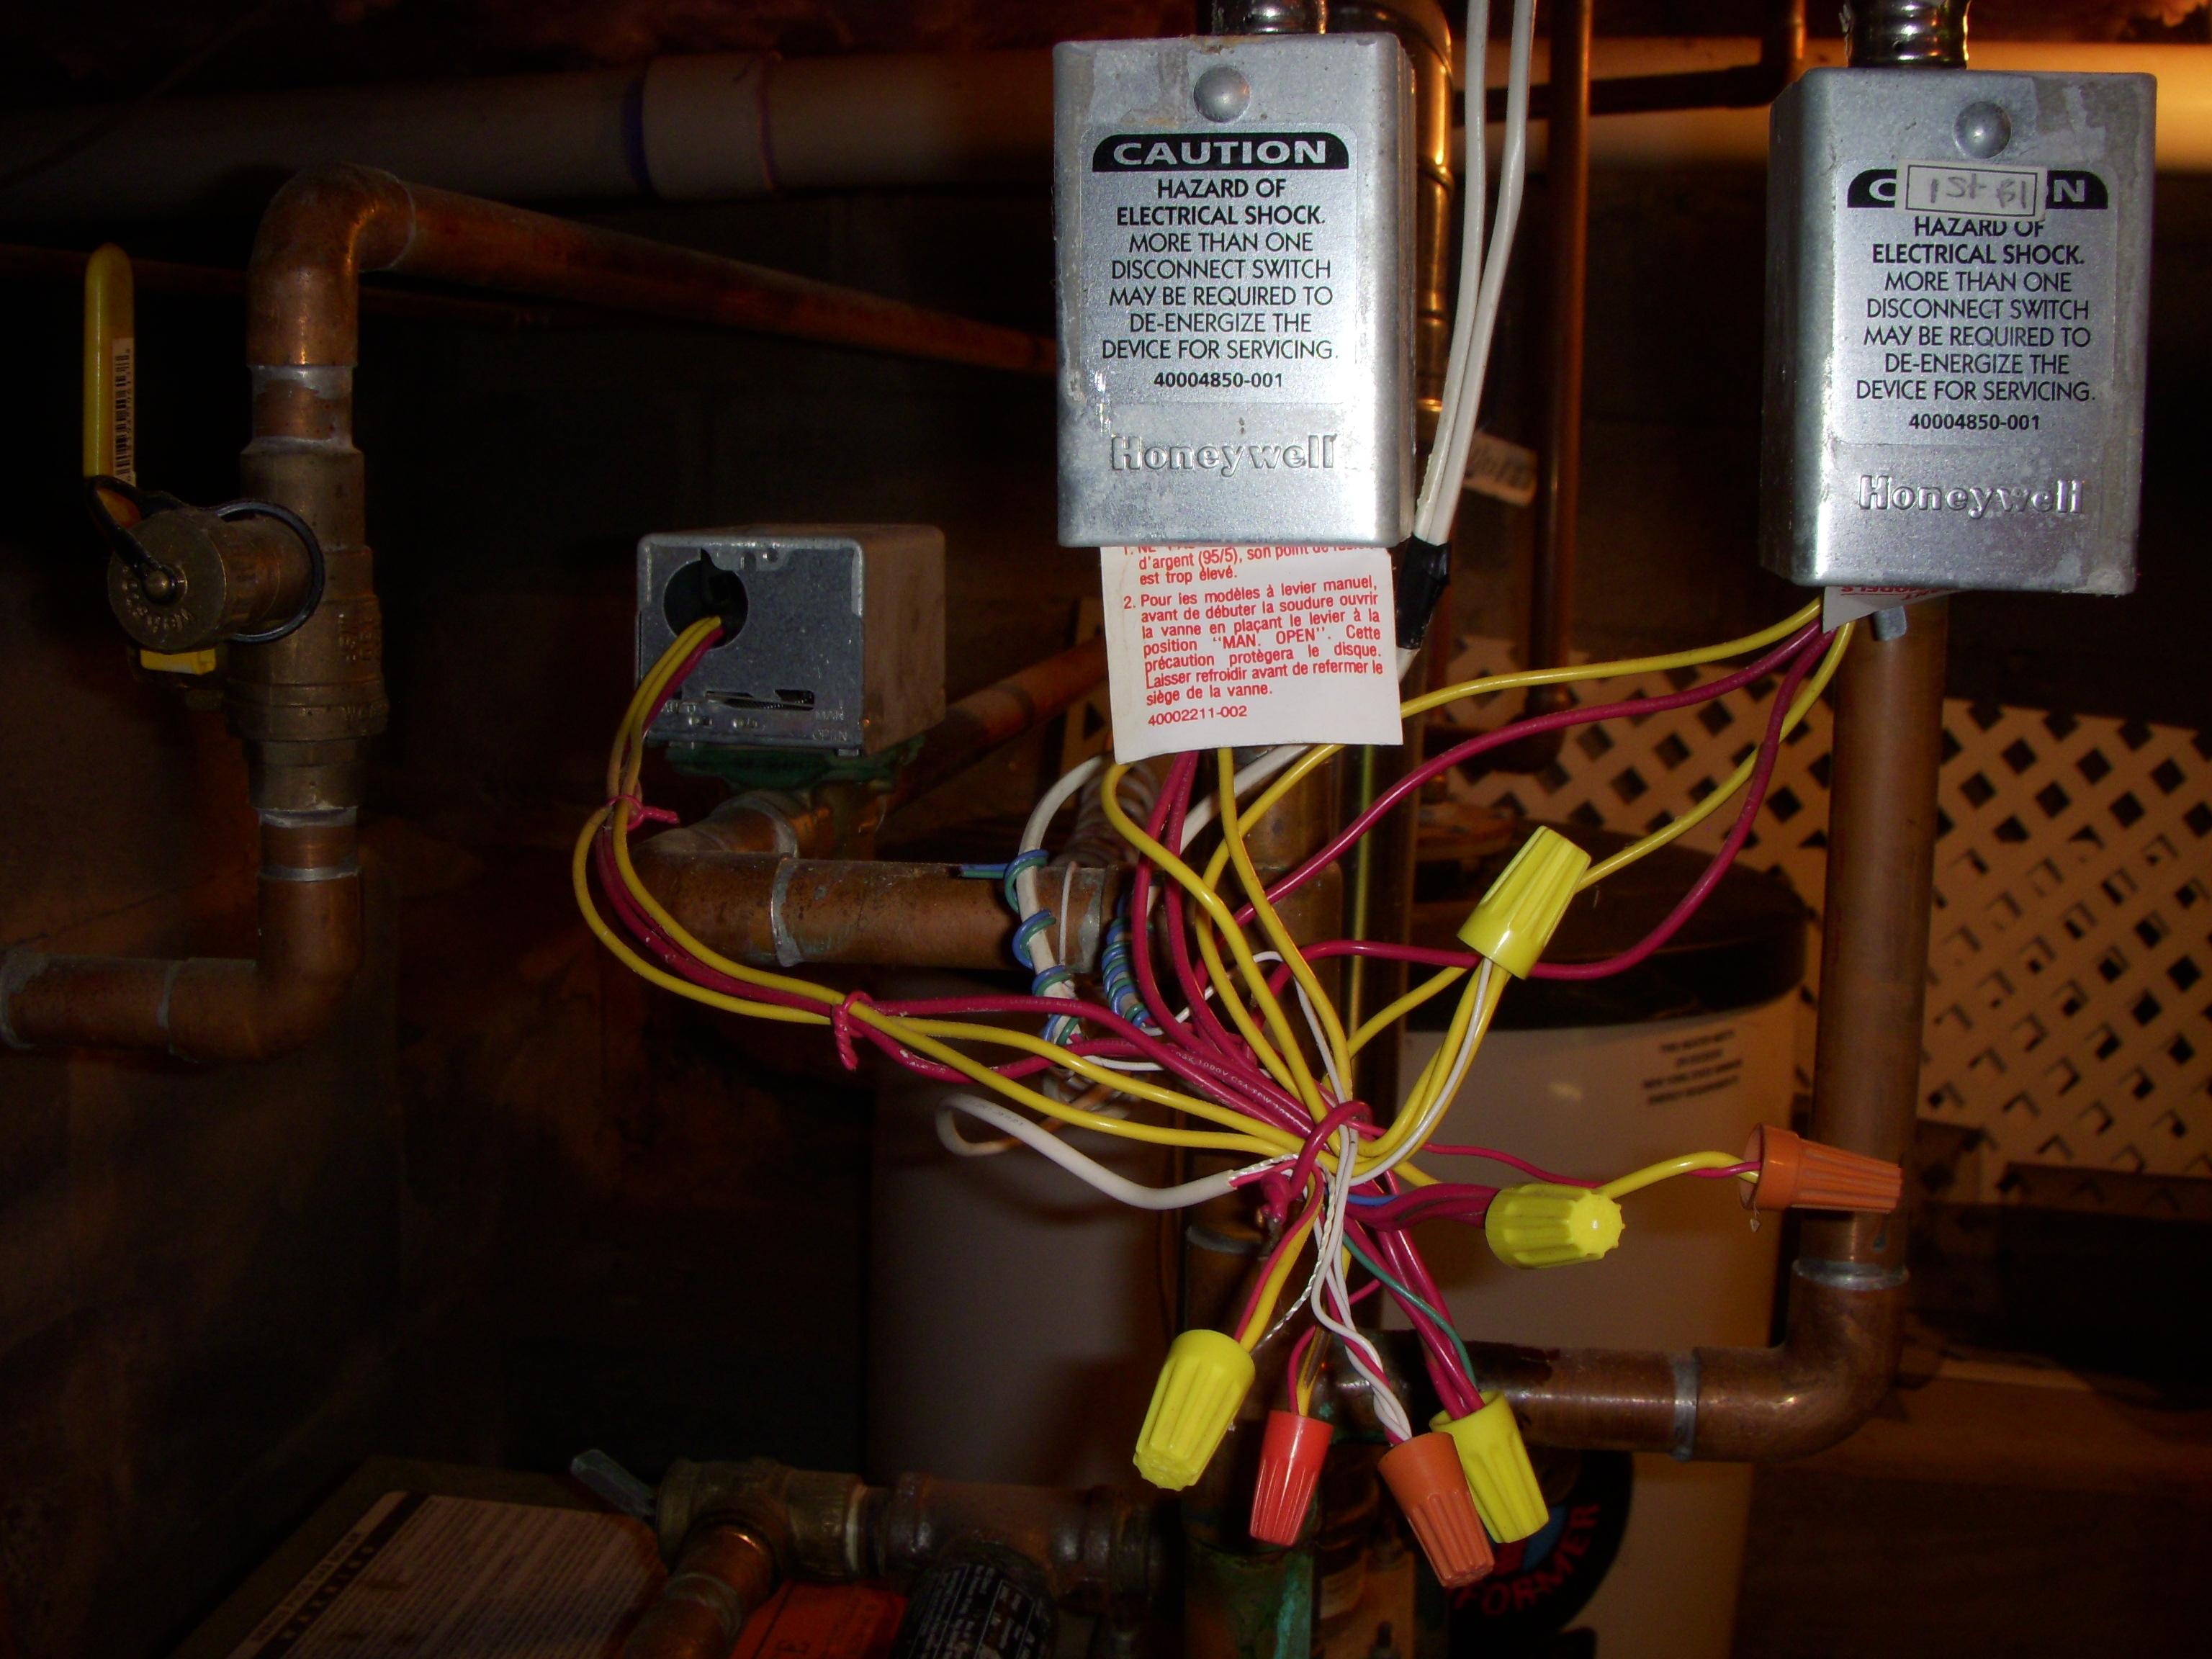 Zvc404 Wiring Diagram Auto Electrical Wilkinson Humbucker Free Download